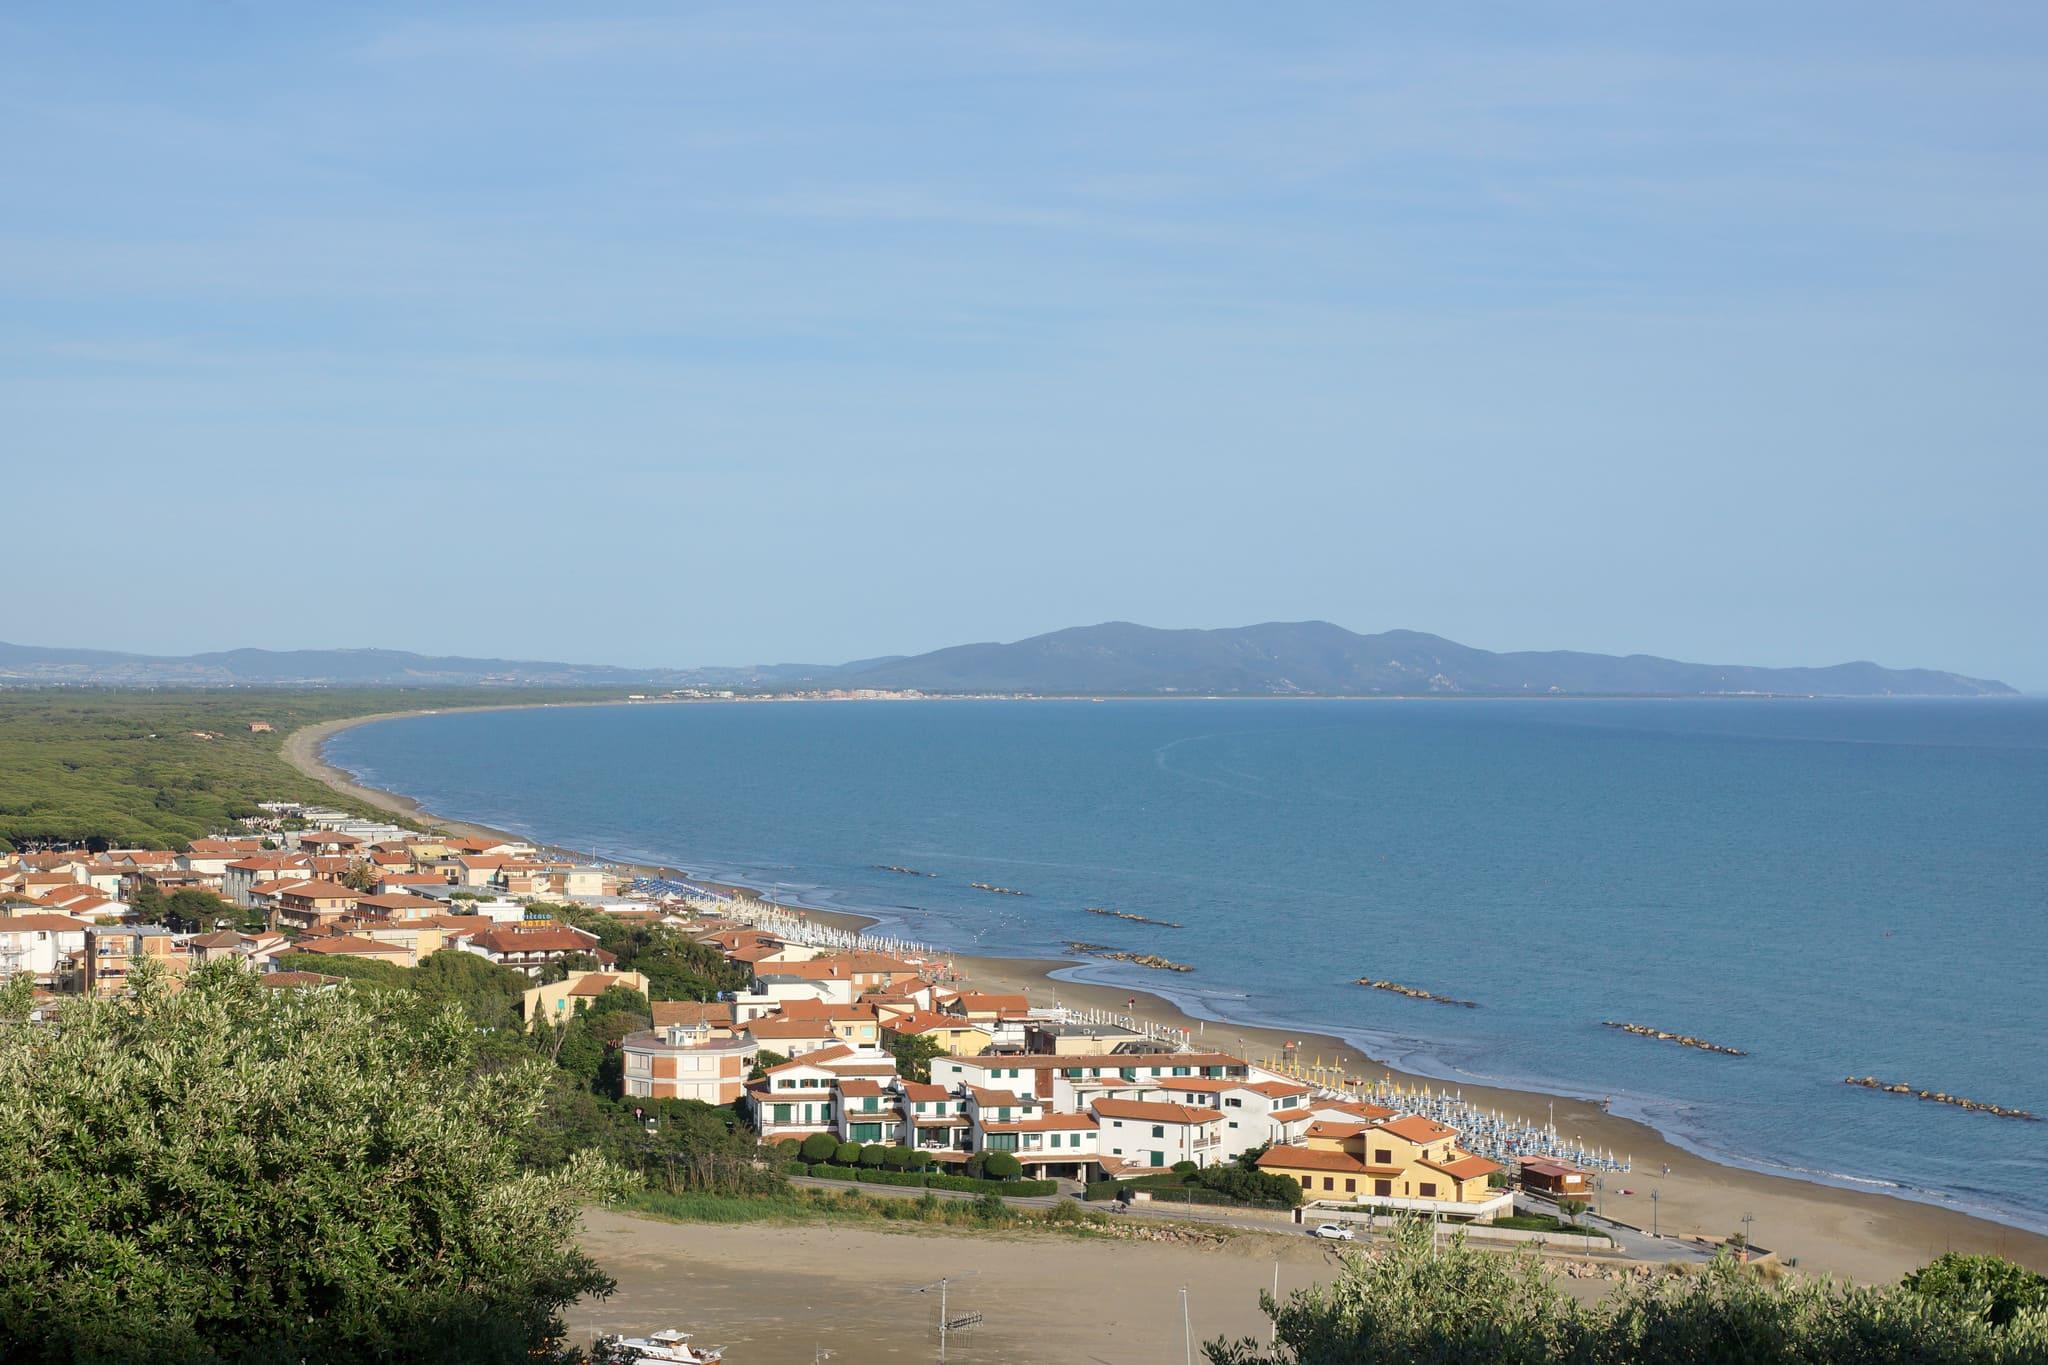 Marina di Grosseto